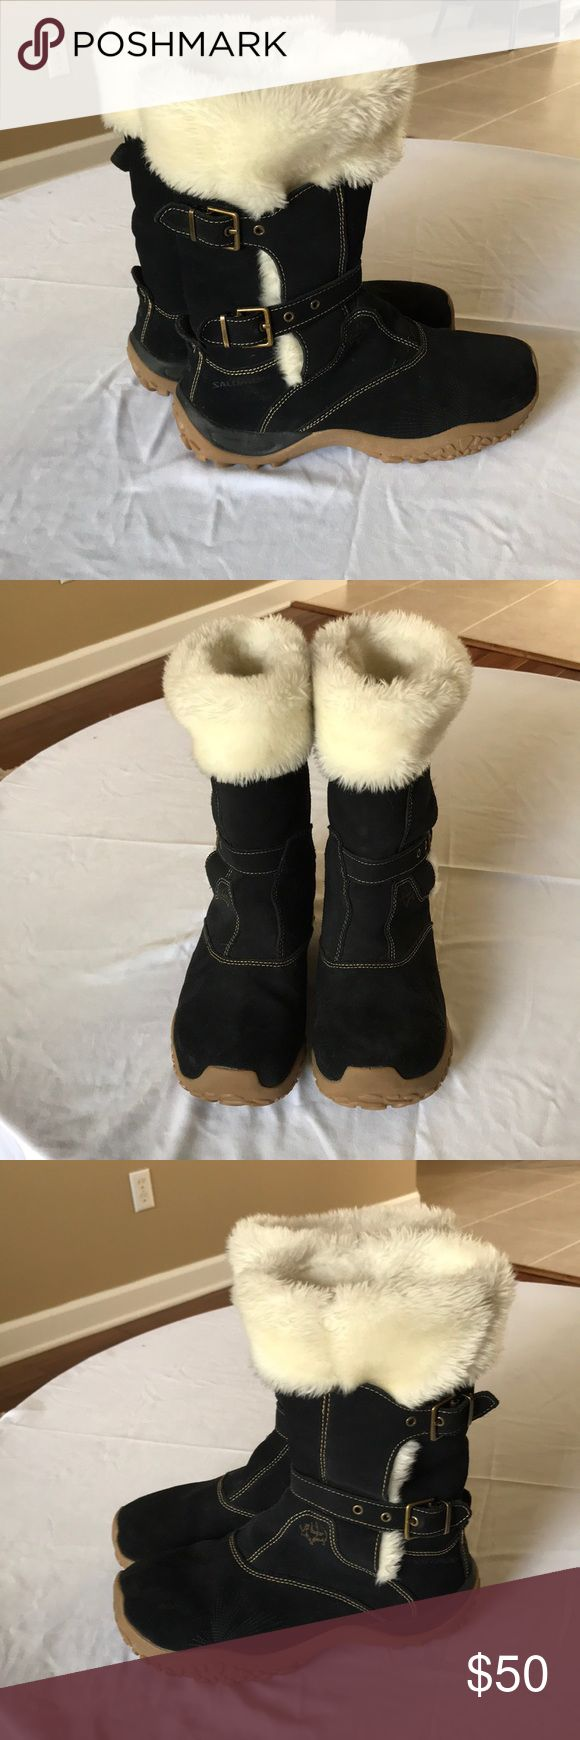 Women's Salomon Boots size 8 Women's Salomon Ski Boots with small signs of wear Salomon Shoes Winter & Rain Boots